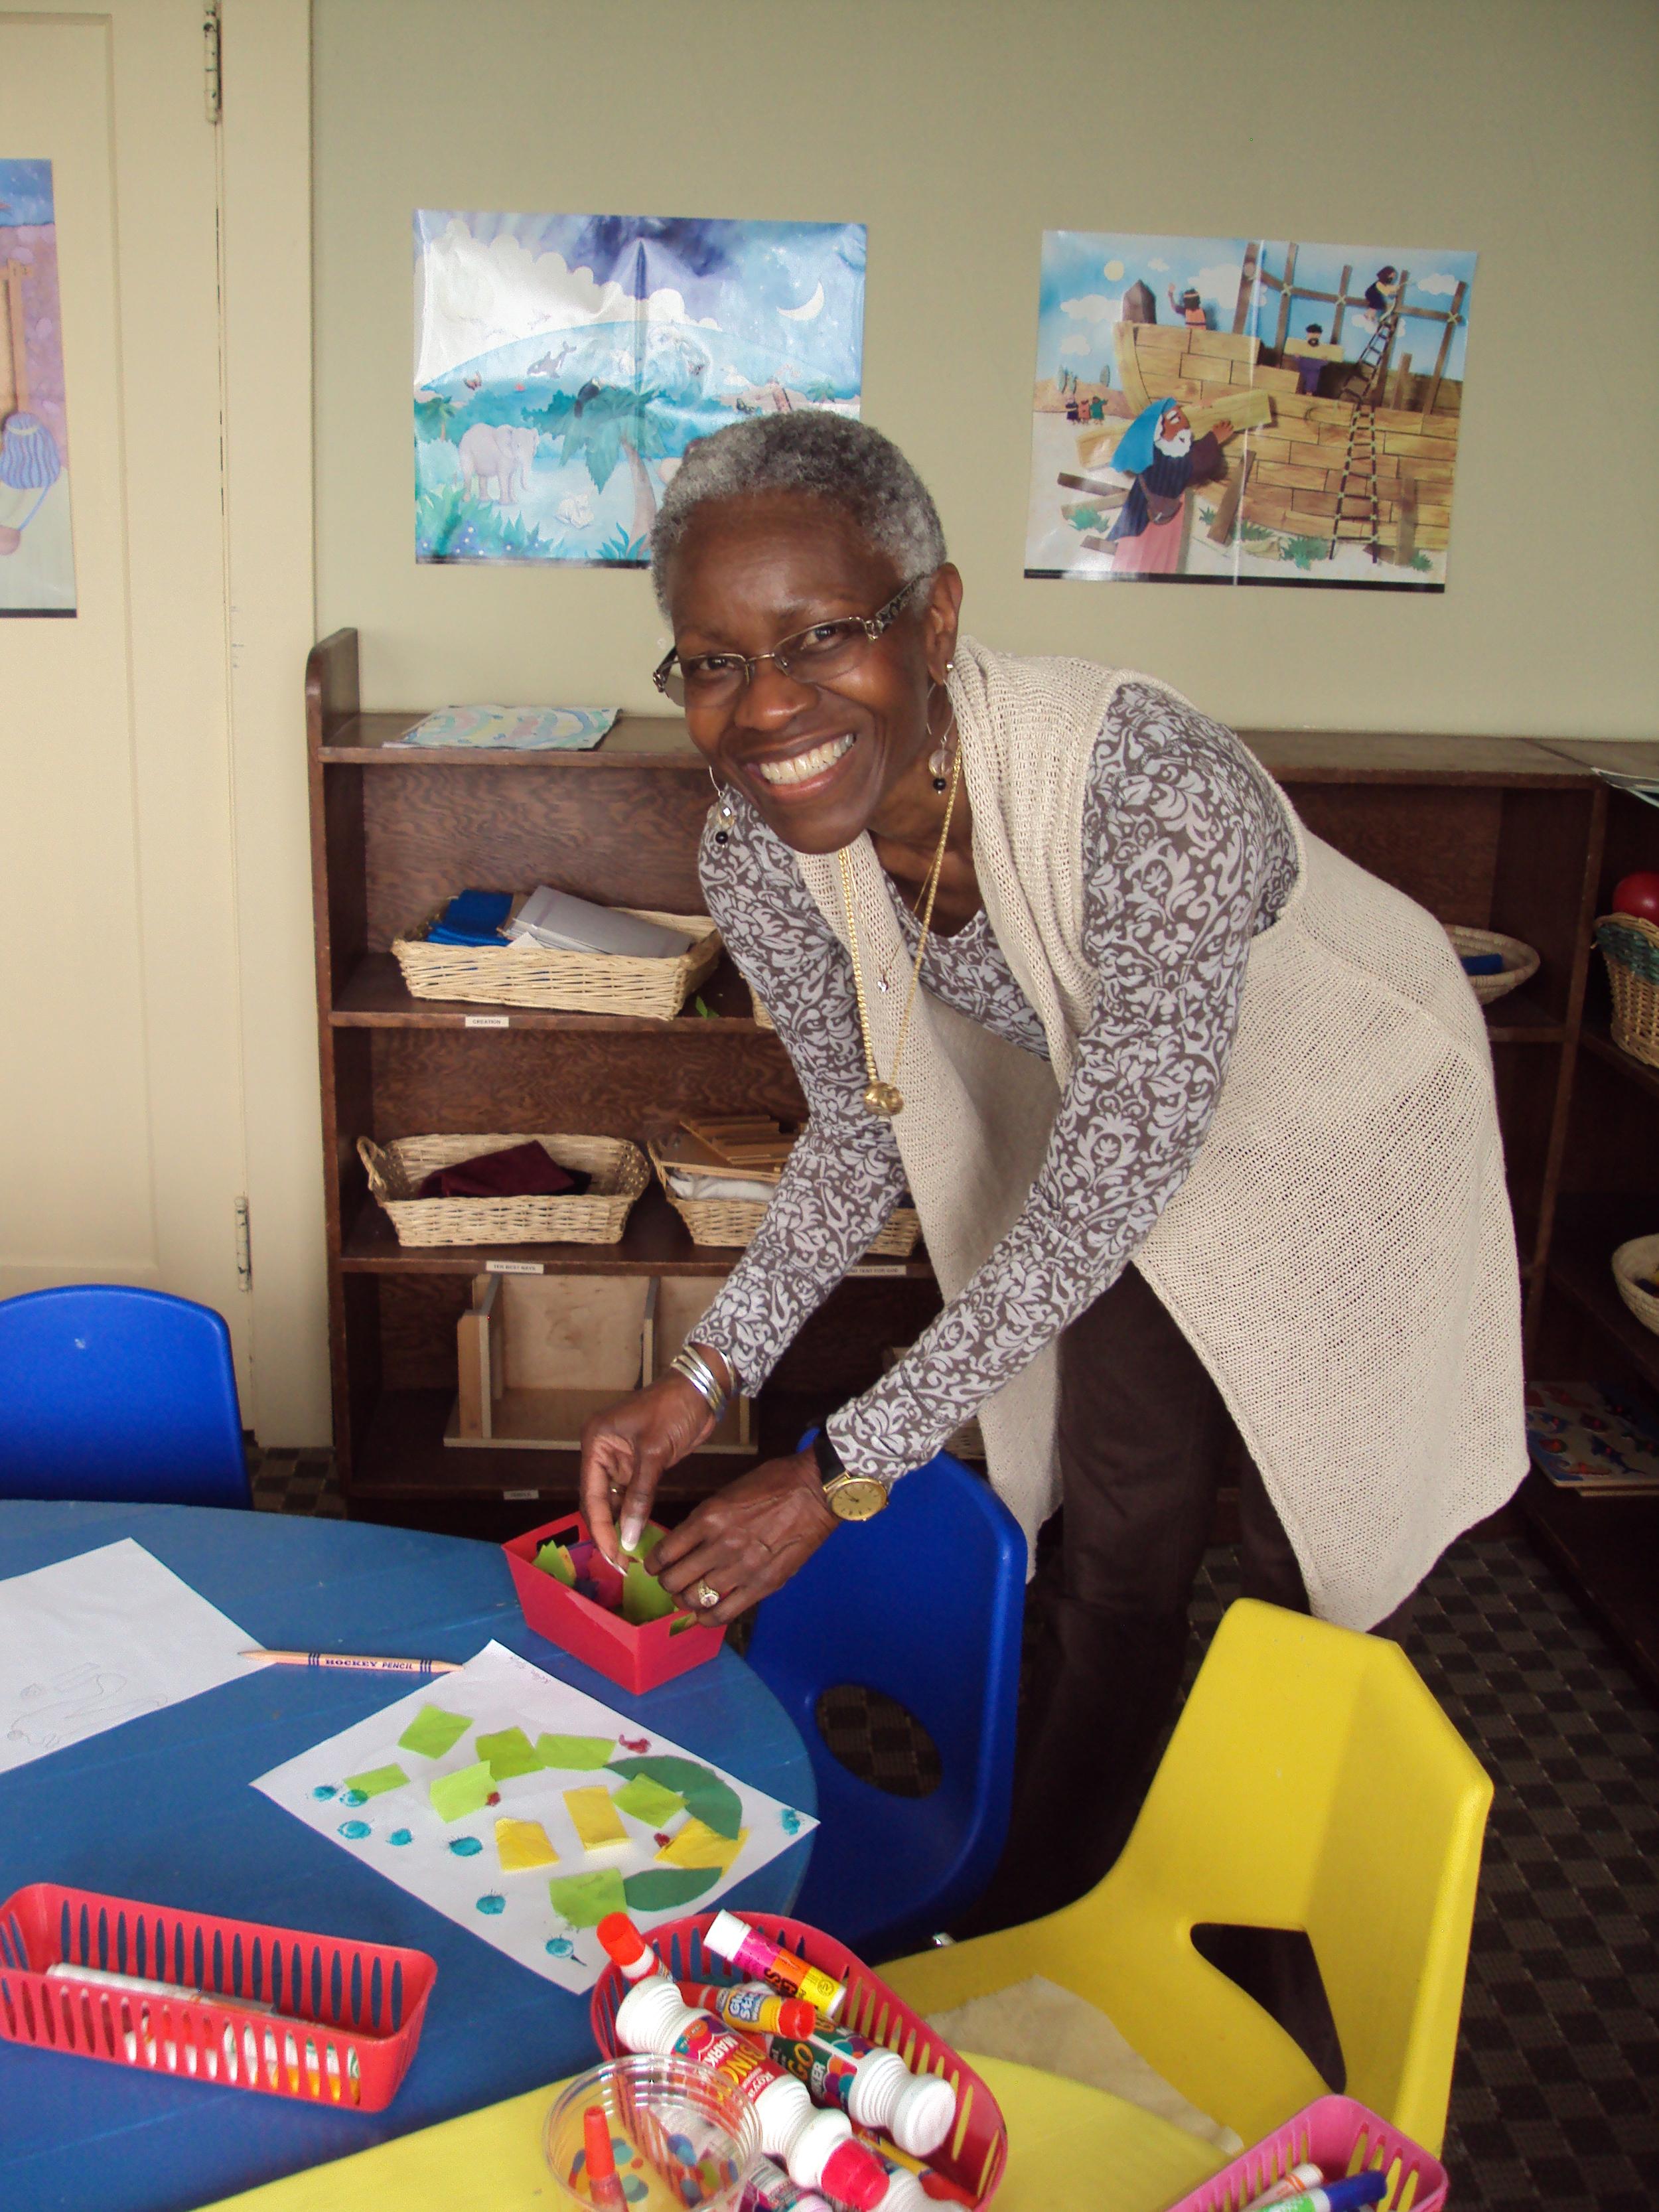 GP Edwina in Godly play area